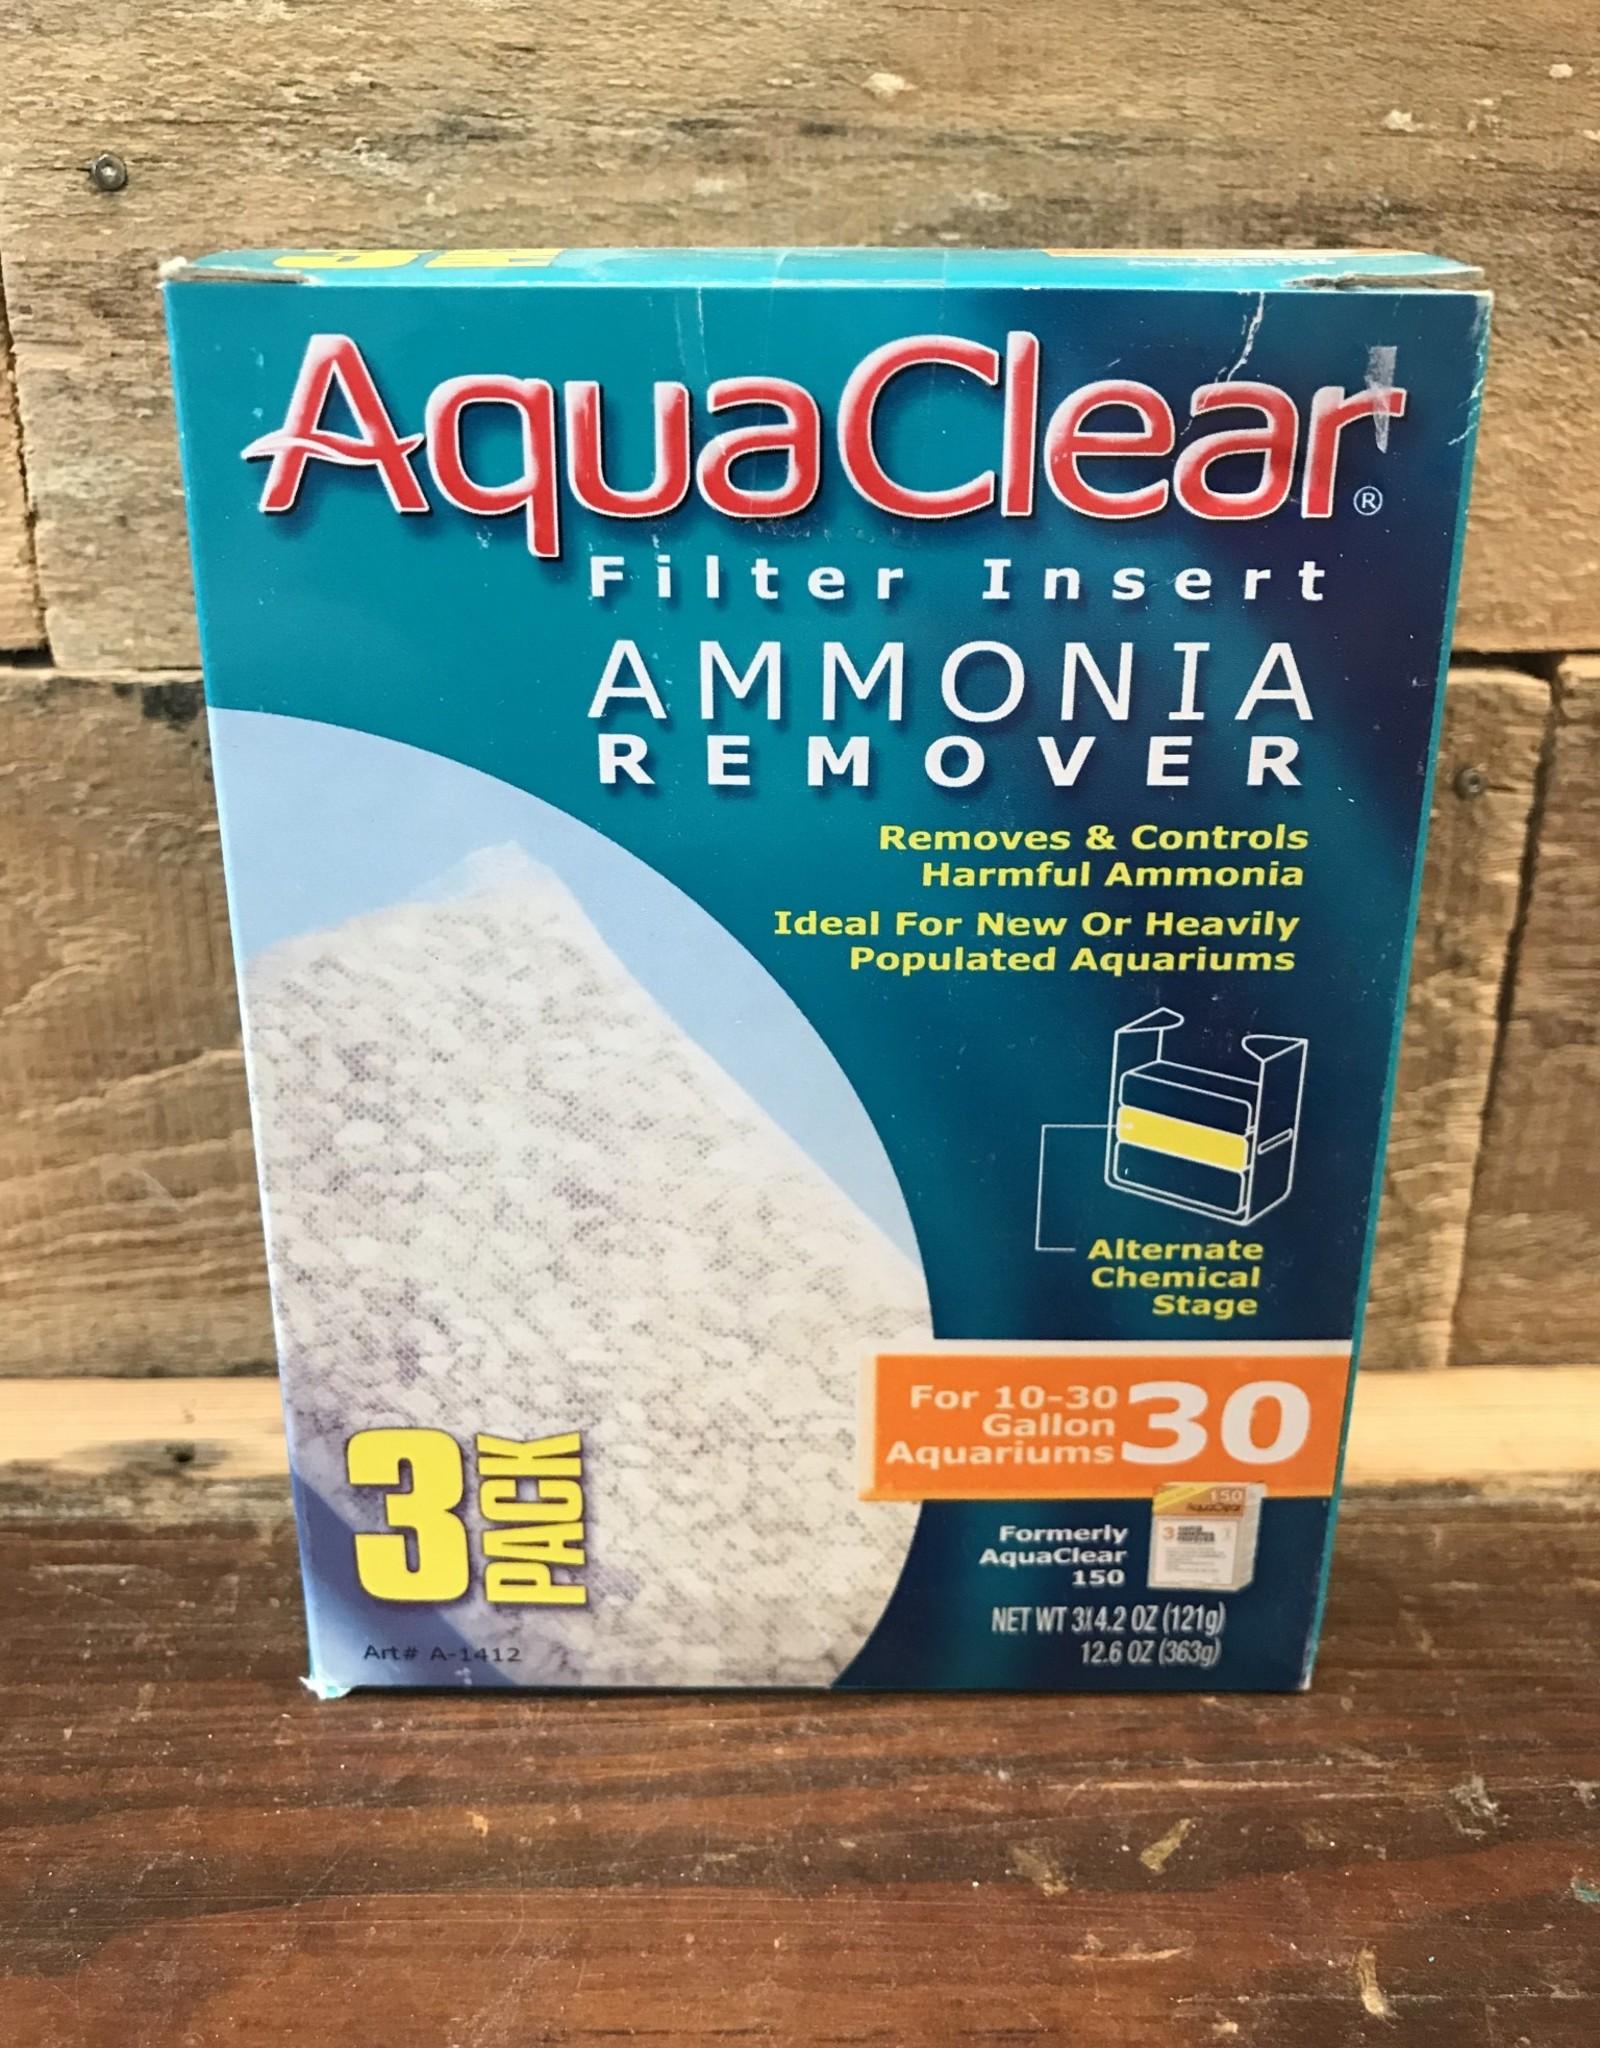 Hagen AquaClear 30 Ammonia Remover (3/pack)